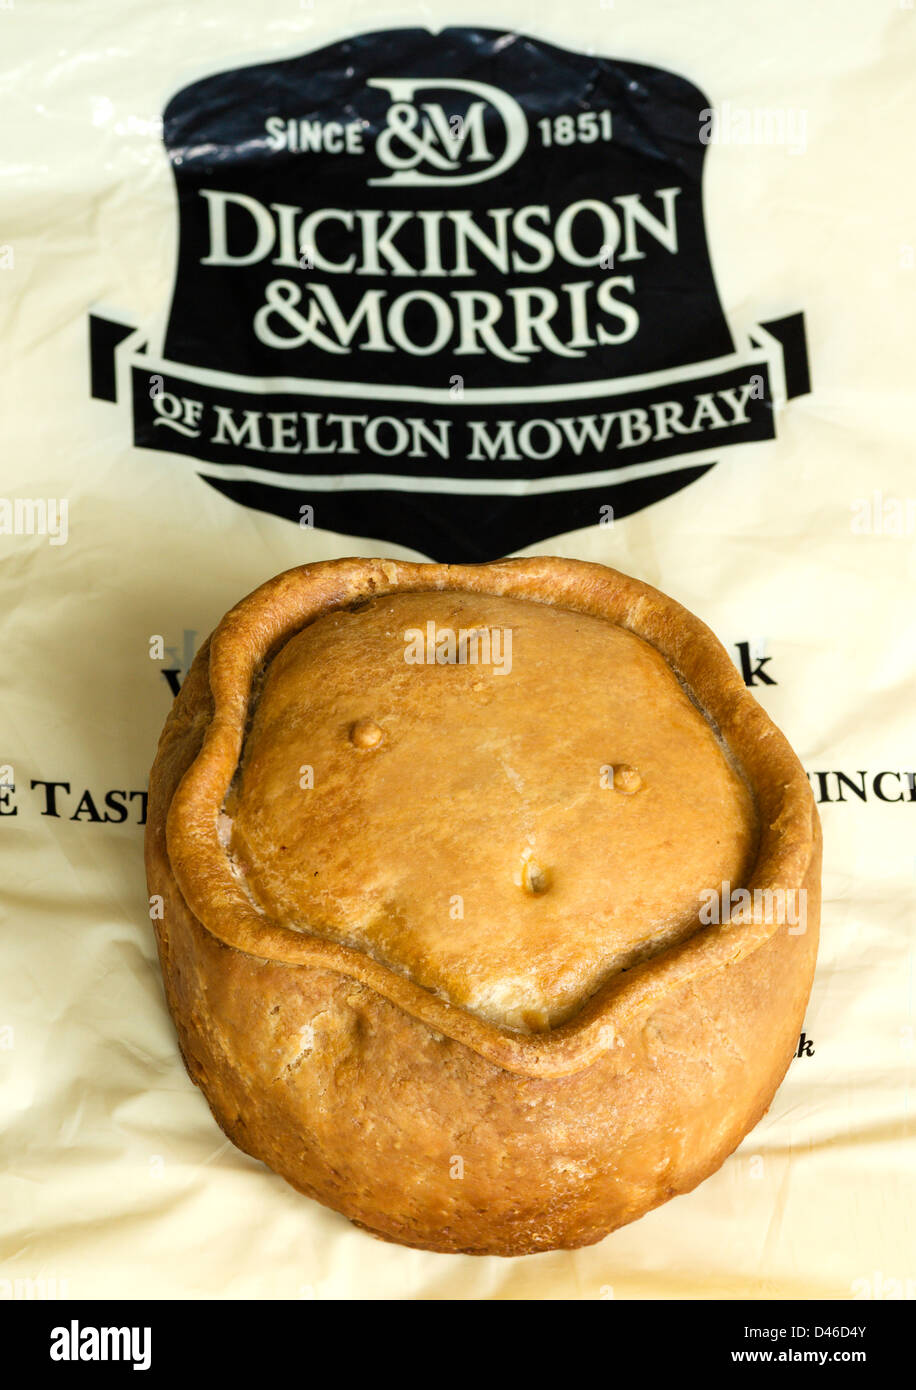 Giant (almost 1kg) genuine Melton Mowbray Pork Pie from Ye Olde Pie Shoppe (Dickinson and Morris), Melton Mowbray, - Stock Image